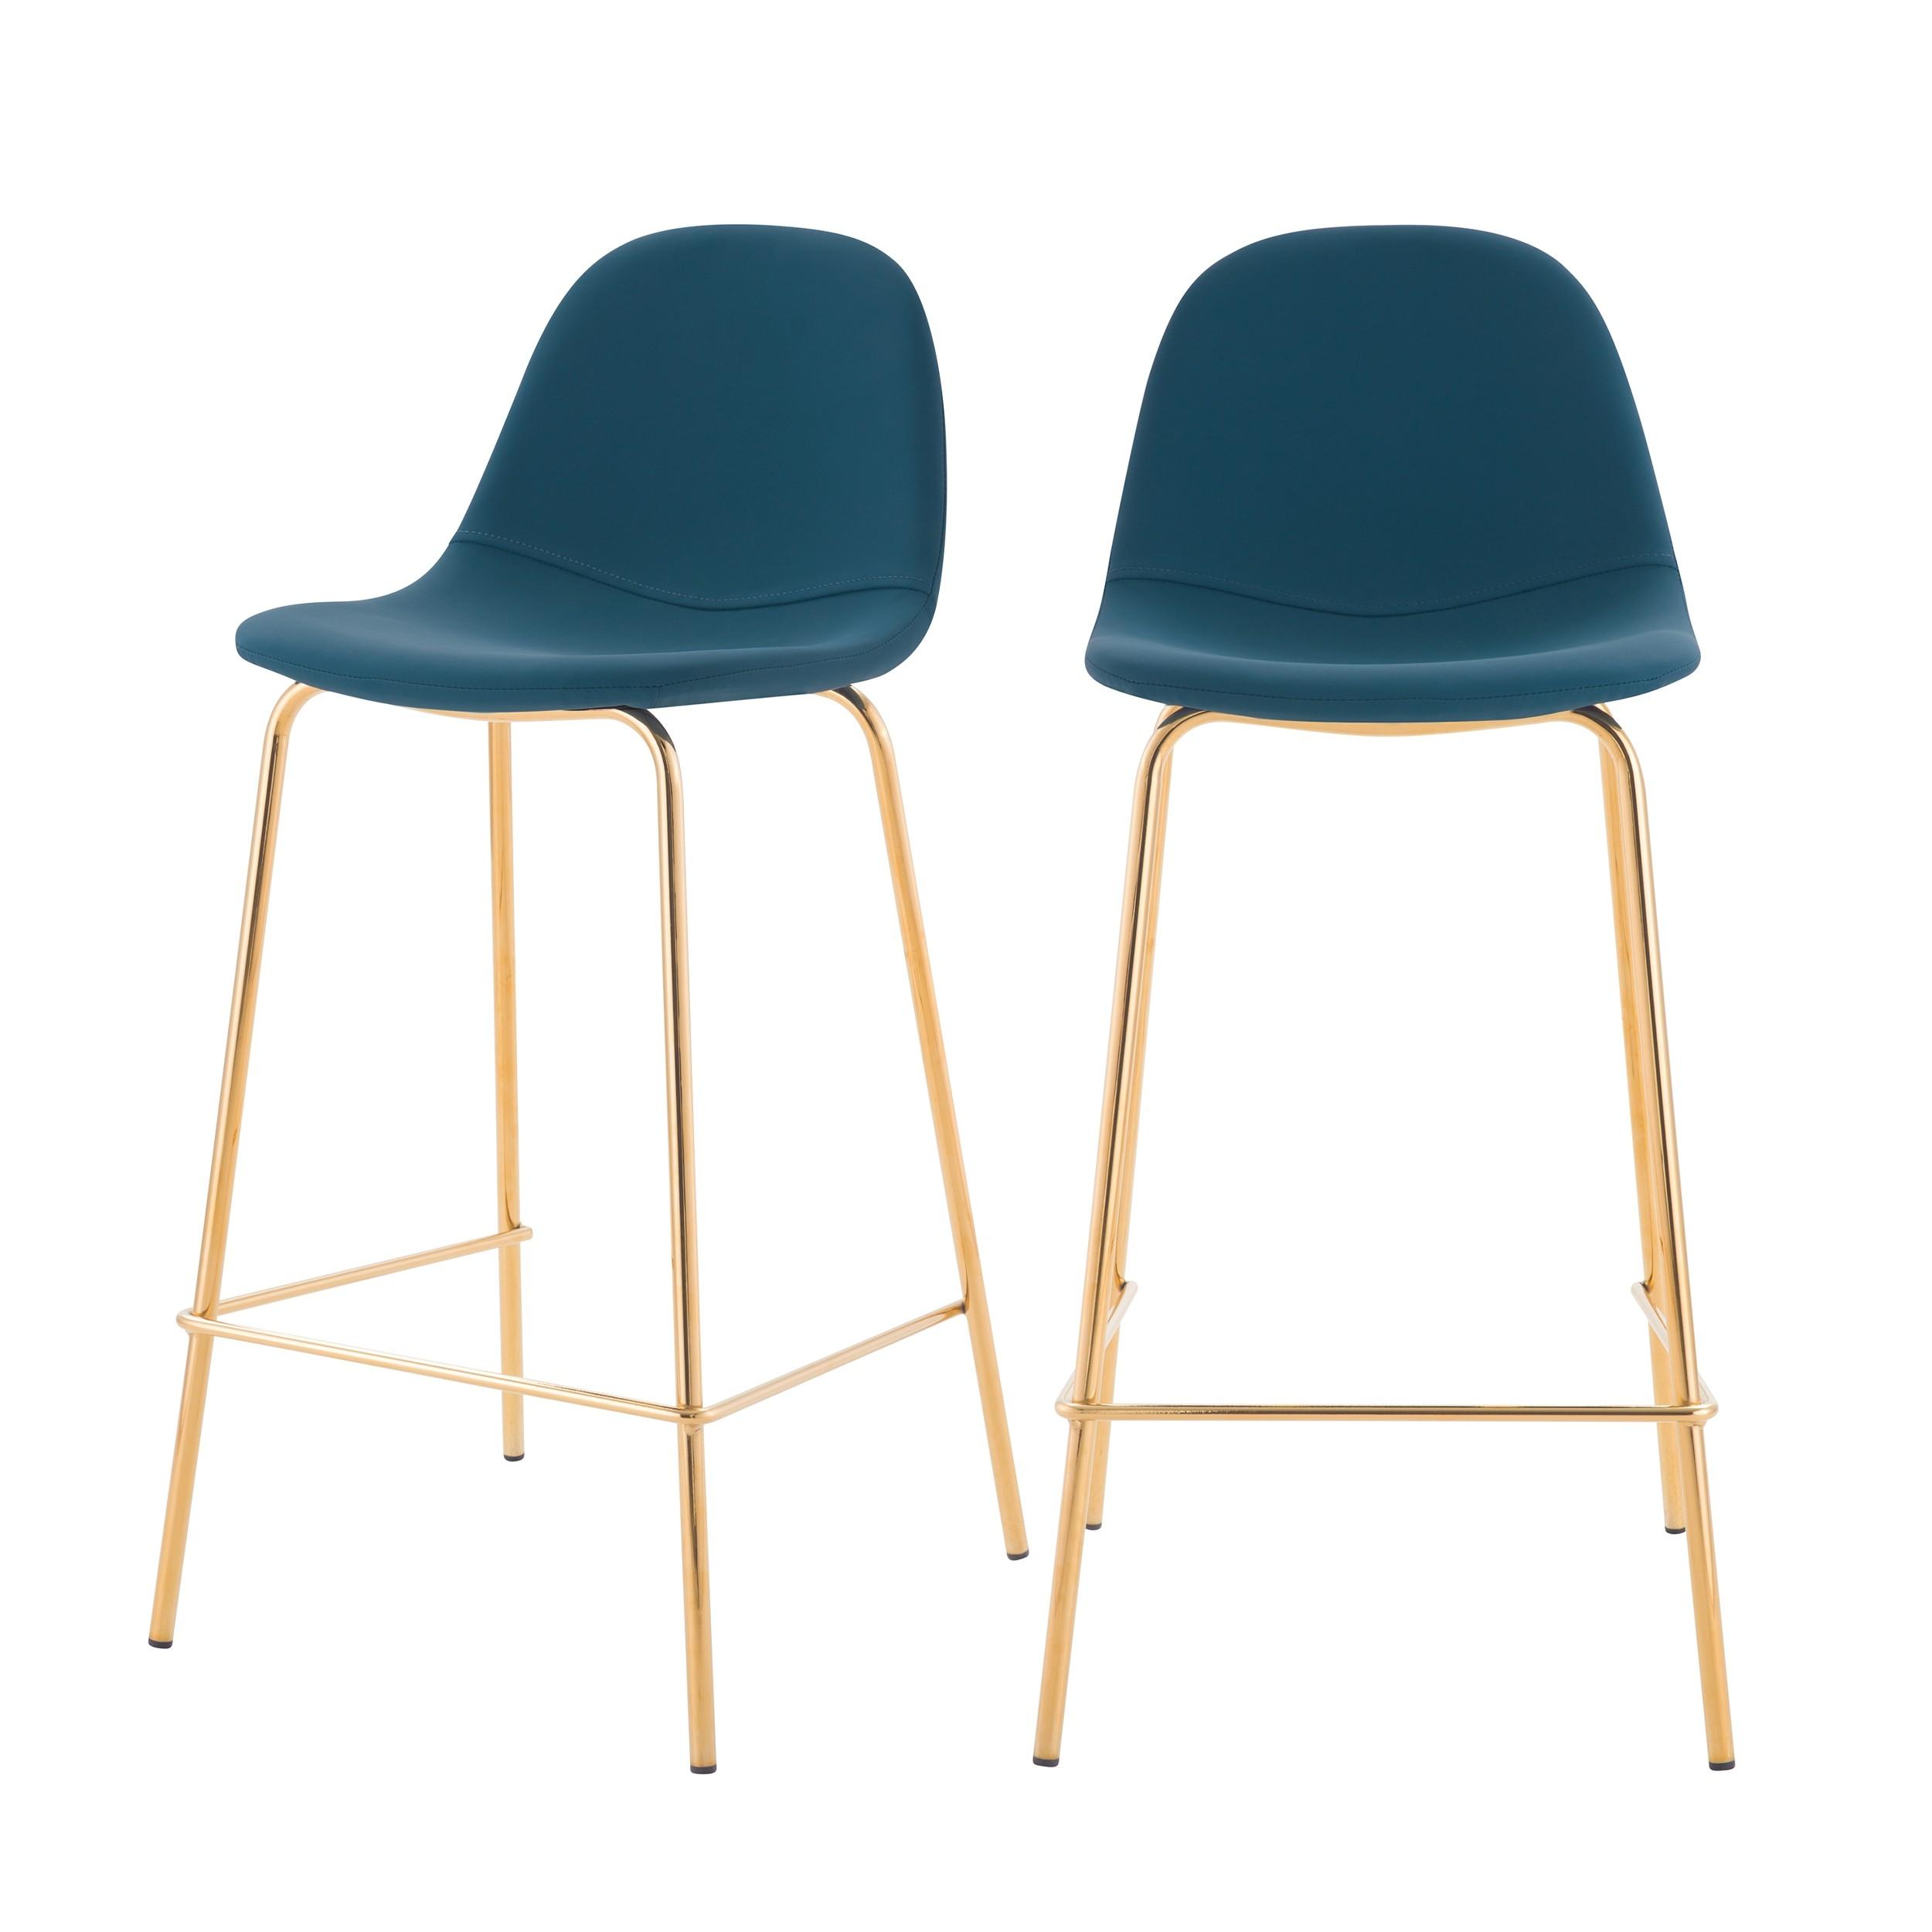 acheter chaise de bar en cuir synthetique bleue